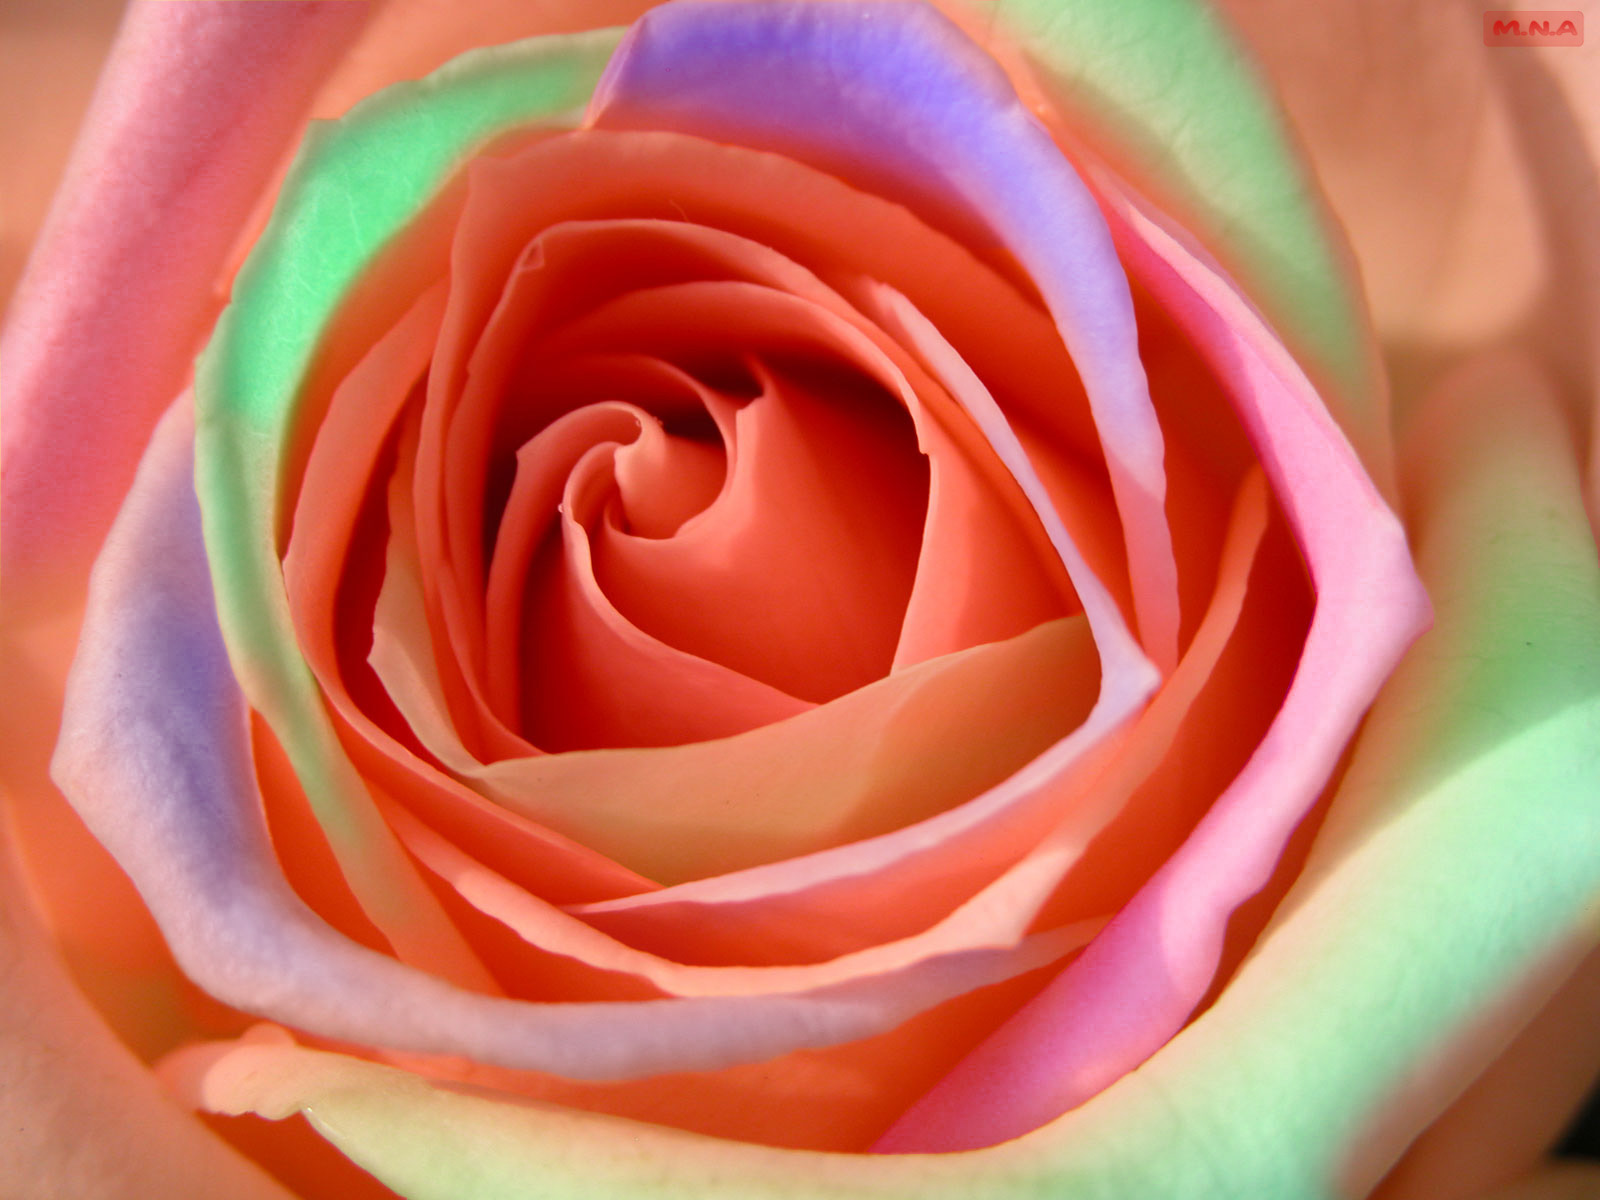 Rose Flowers Wallpaper Download Rose Flower Wallpaper